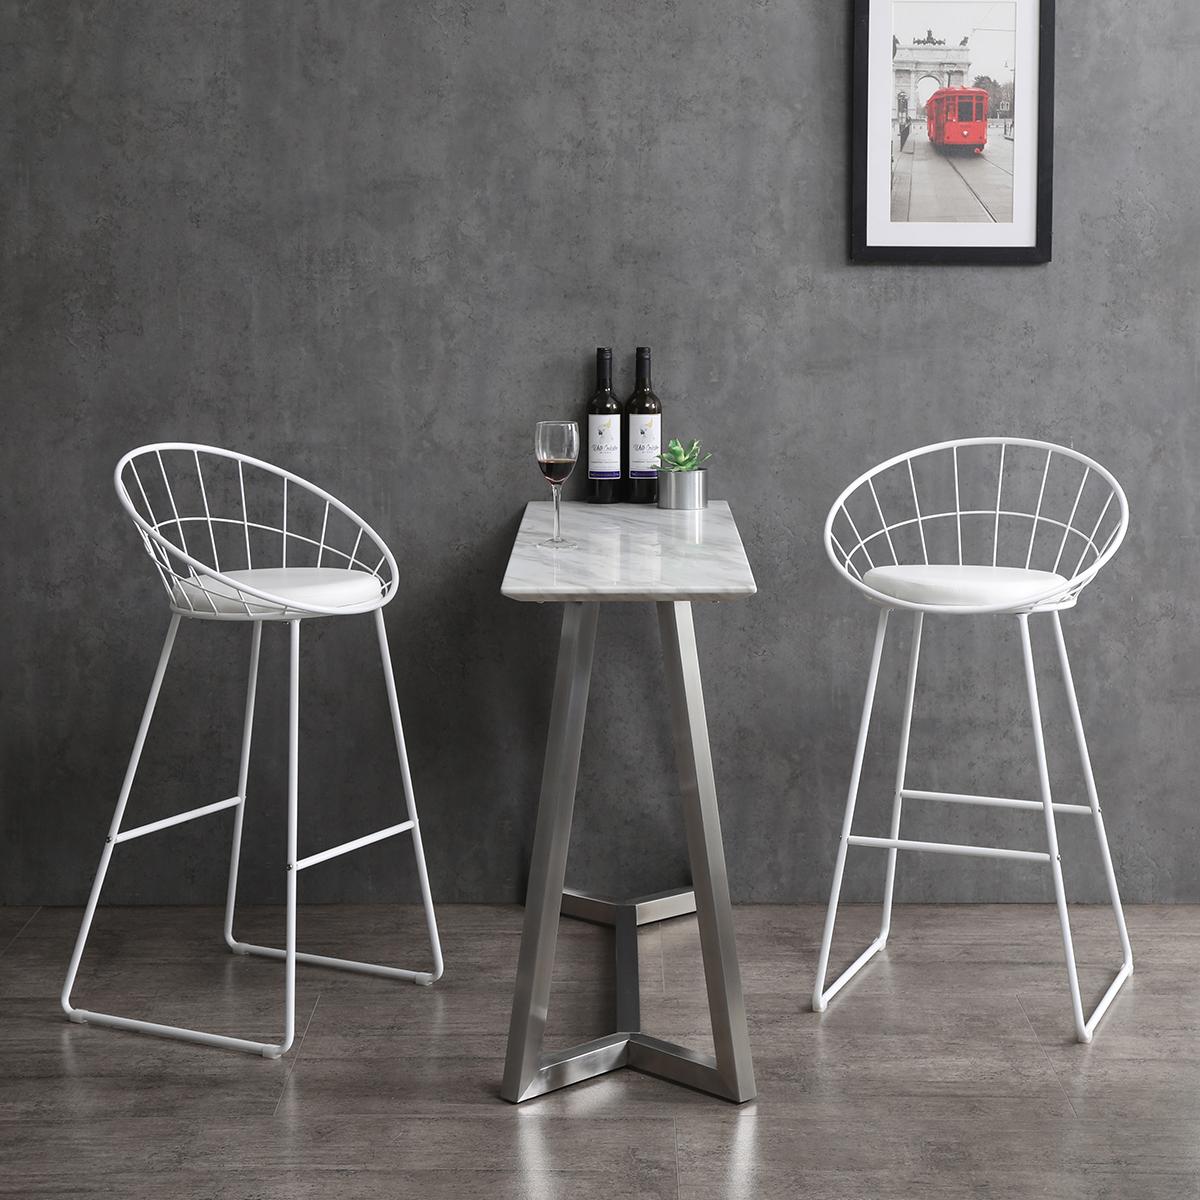 Nordic Bar Stool Bar Chair Wrought Iron Stool Modern Minimalist Barstool Set Of 2 Christies Home Living